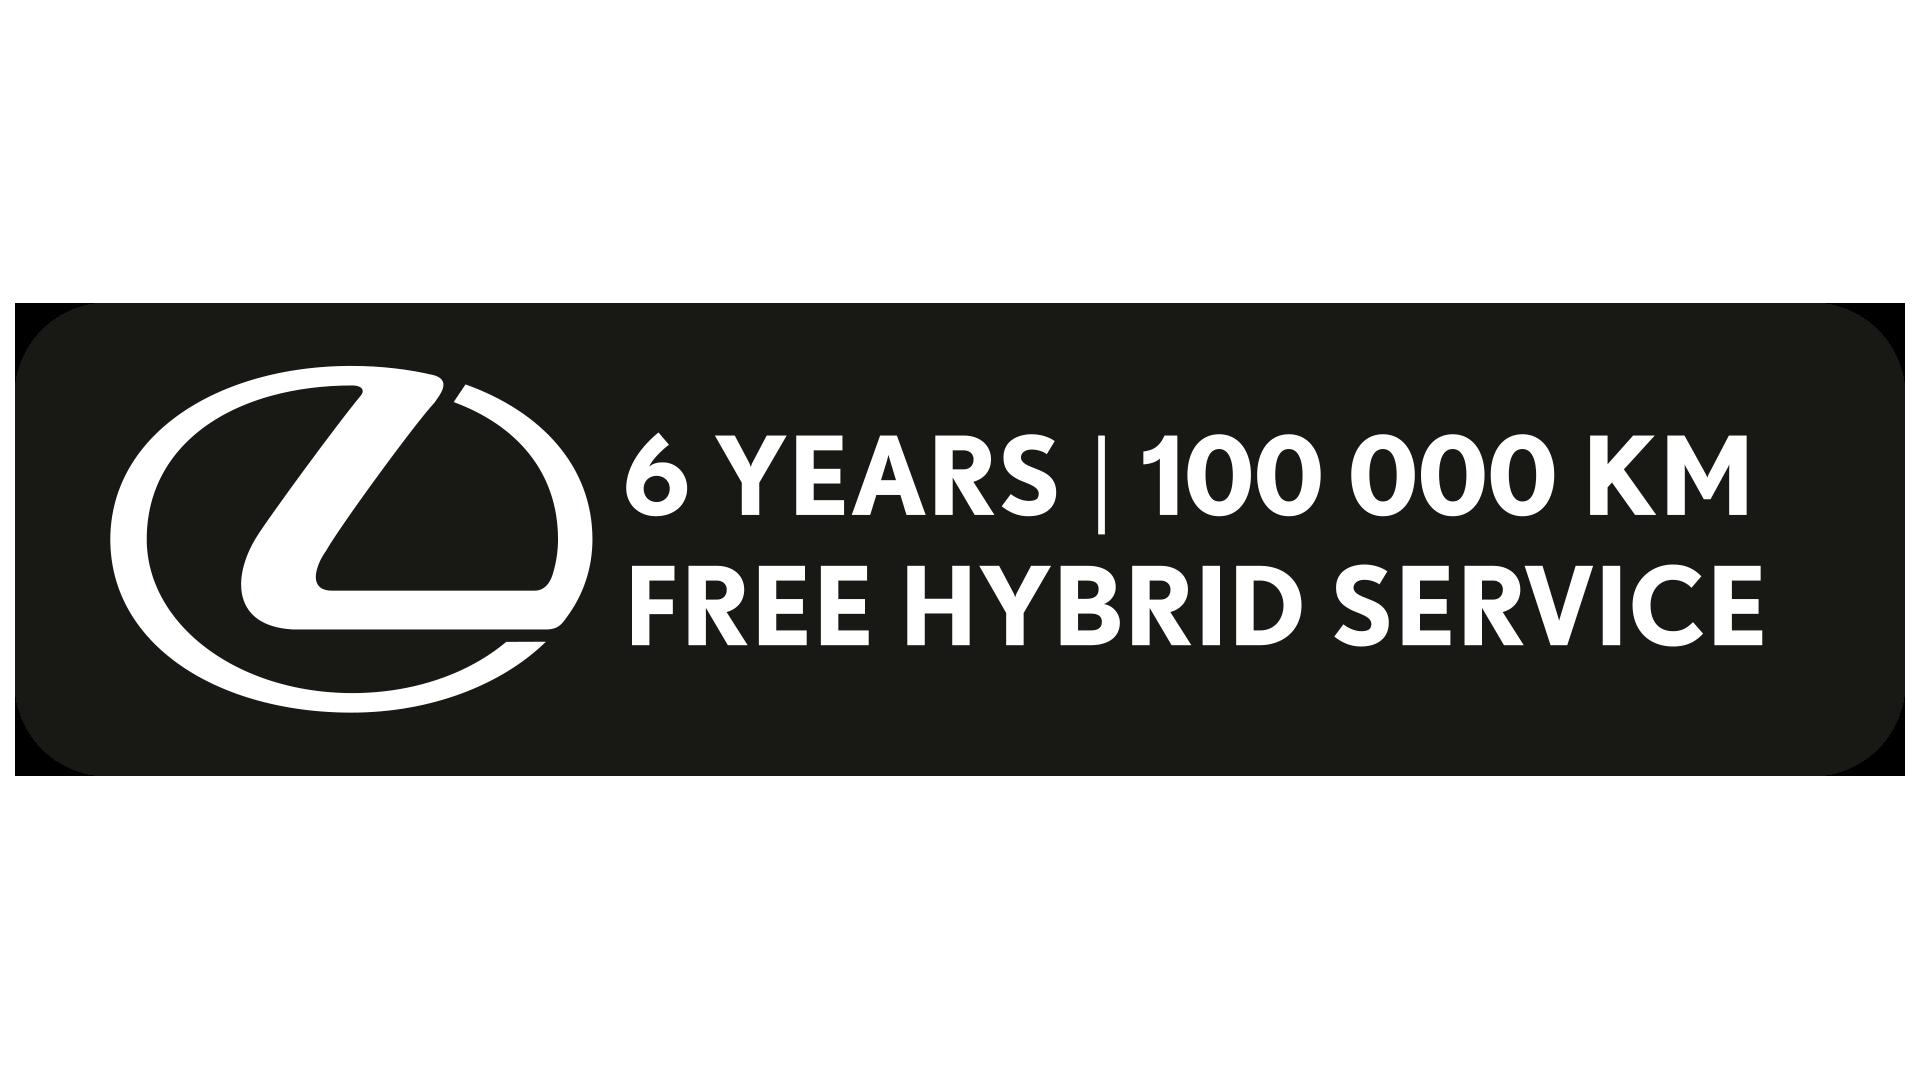 Lexus 6 years logo image